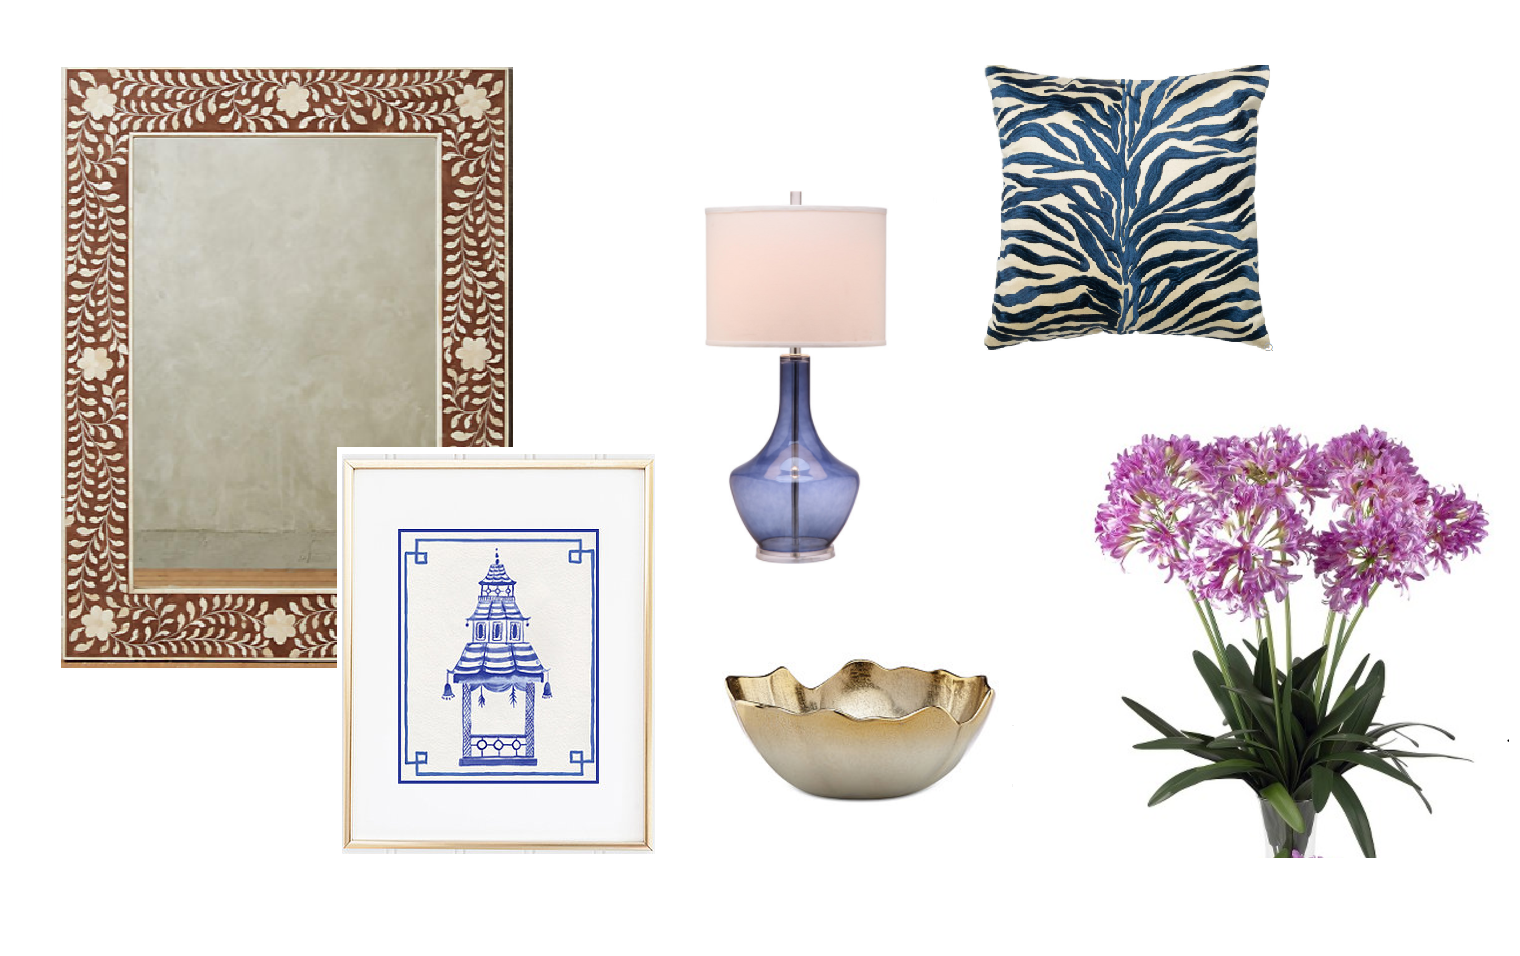 mirror  /  pagoda print  /  table lamp  /  nut bowl  /  throw pillow